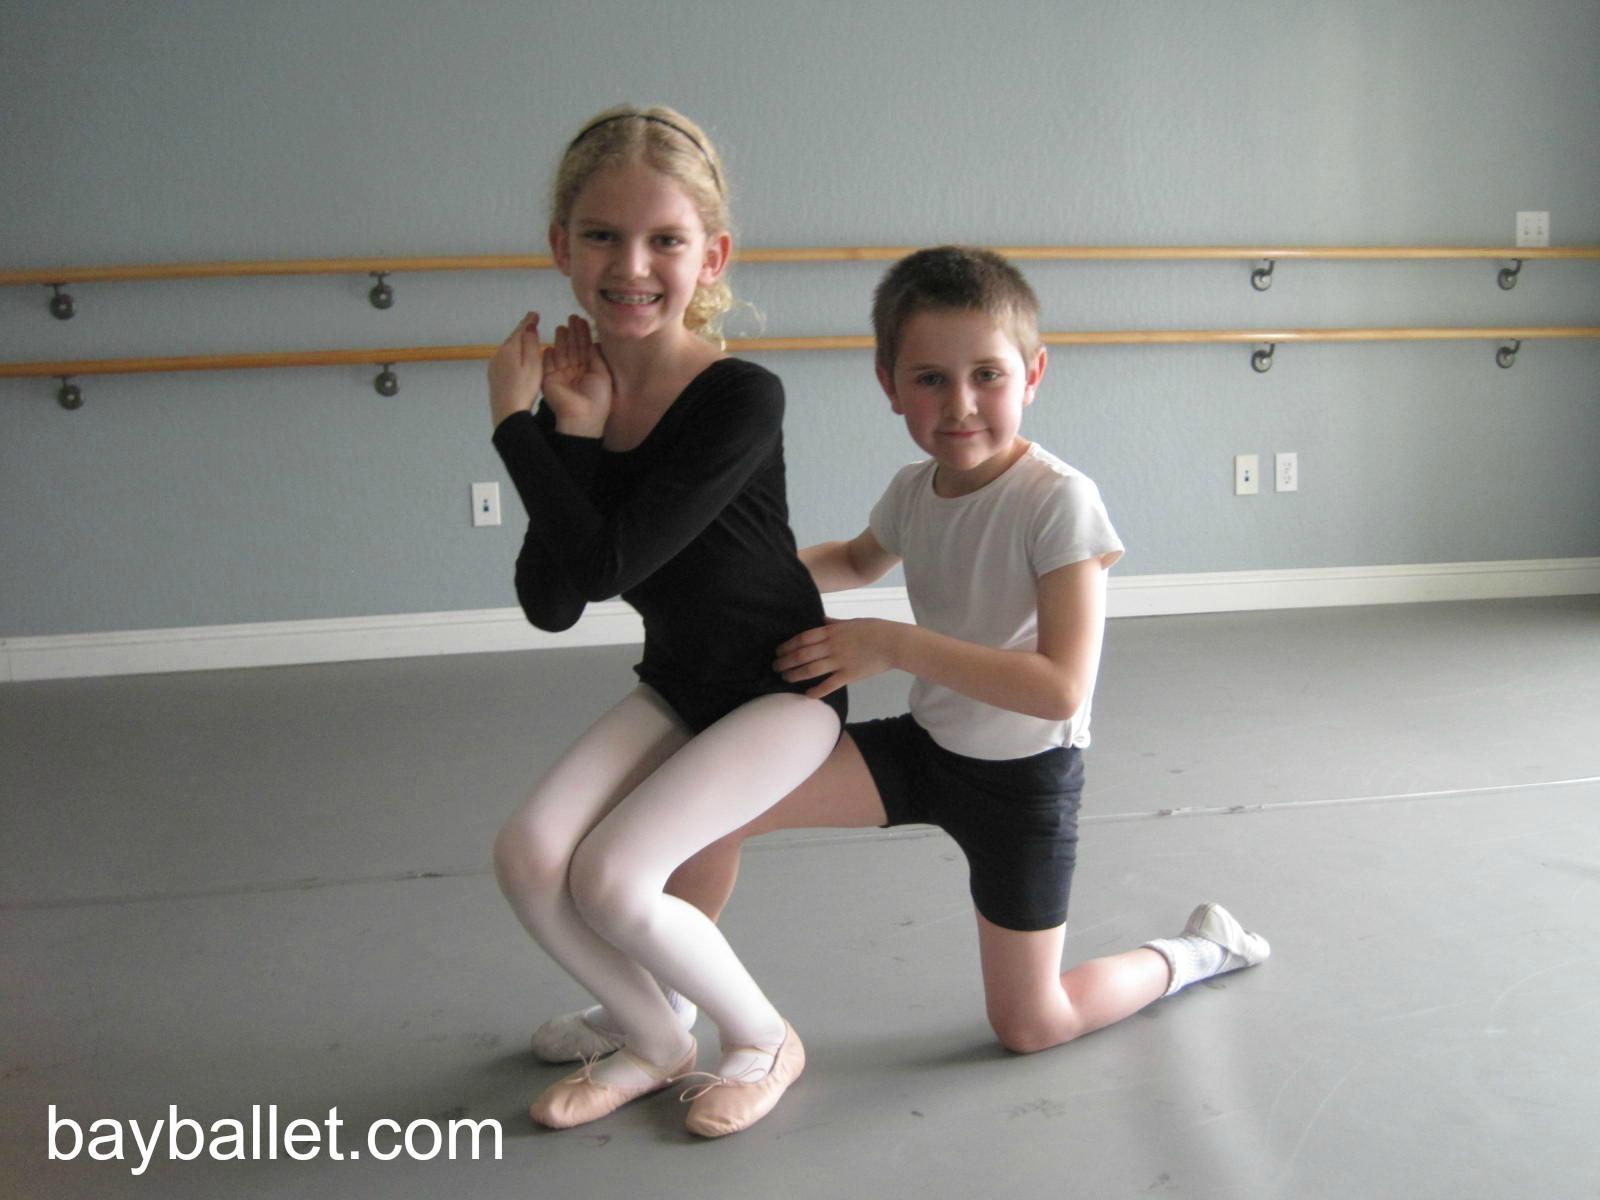 Bay_Ballet_Academy_San_Jose_Willow_Glen_Maximo_Califano_Dance_Classes_Jazz_Lyrical_Hip_Hop_Modern_Neoclassical_Class_6